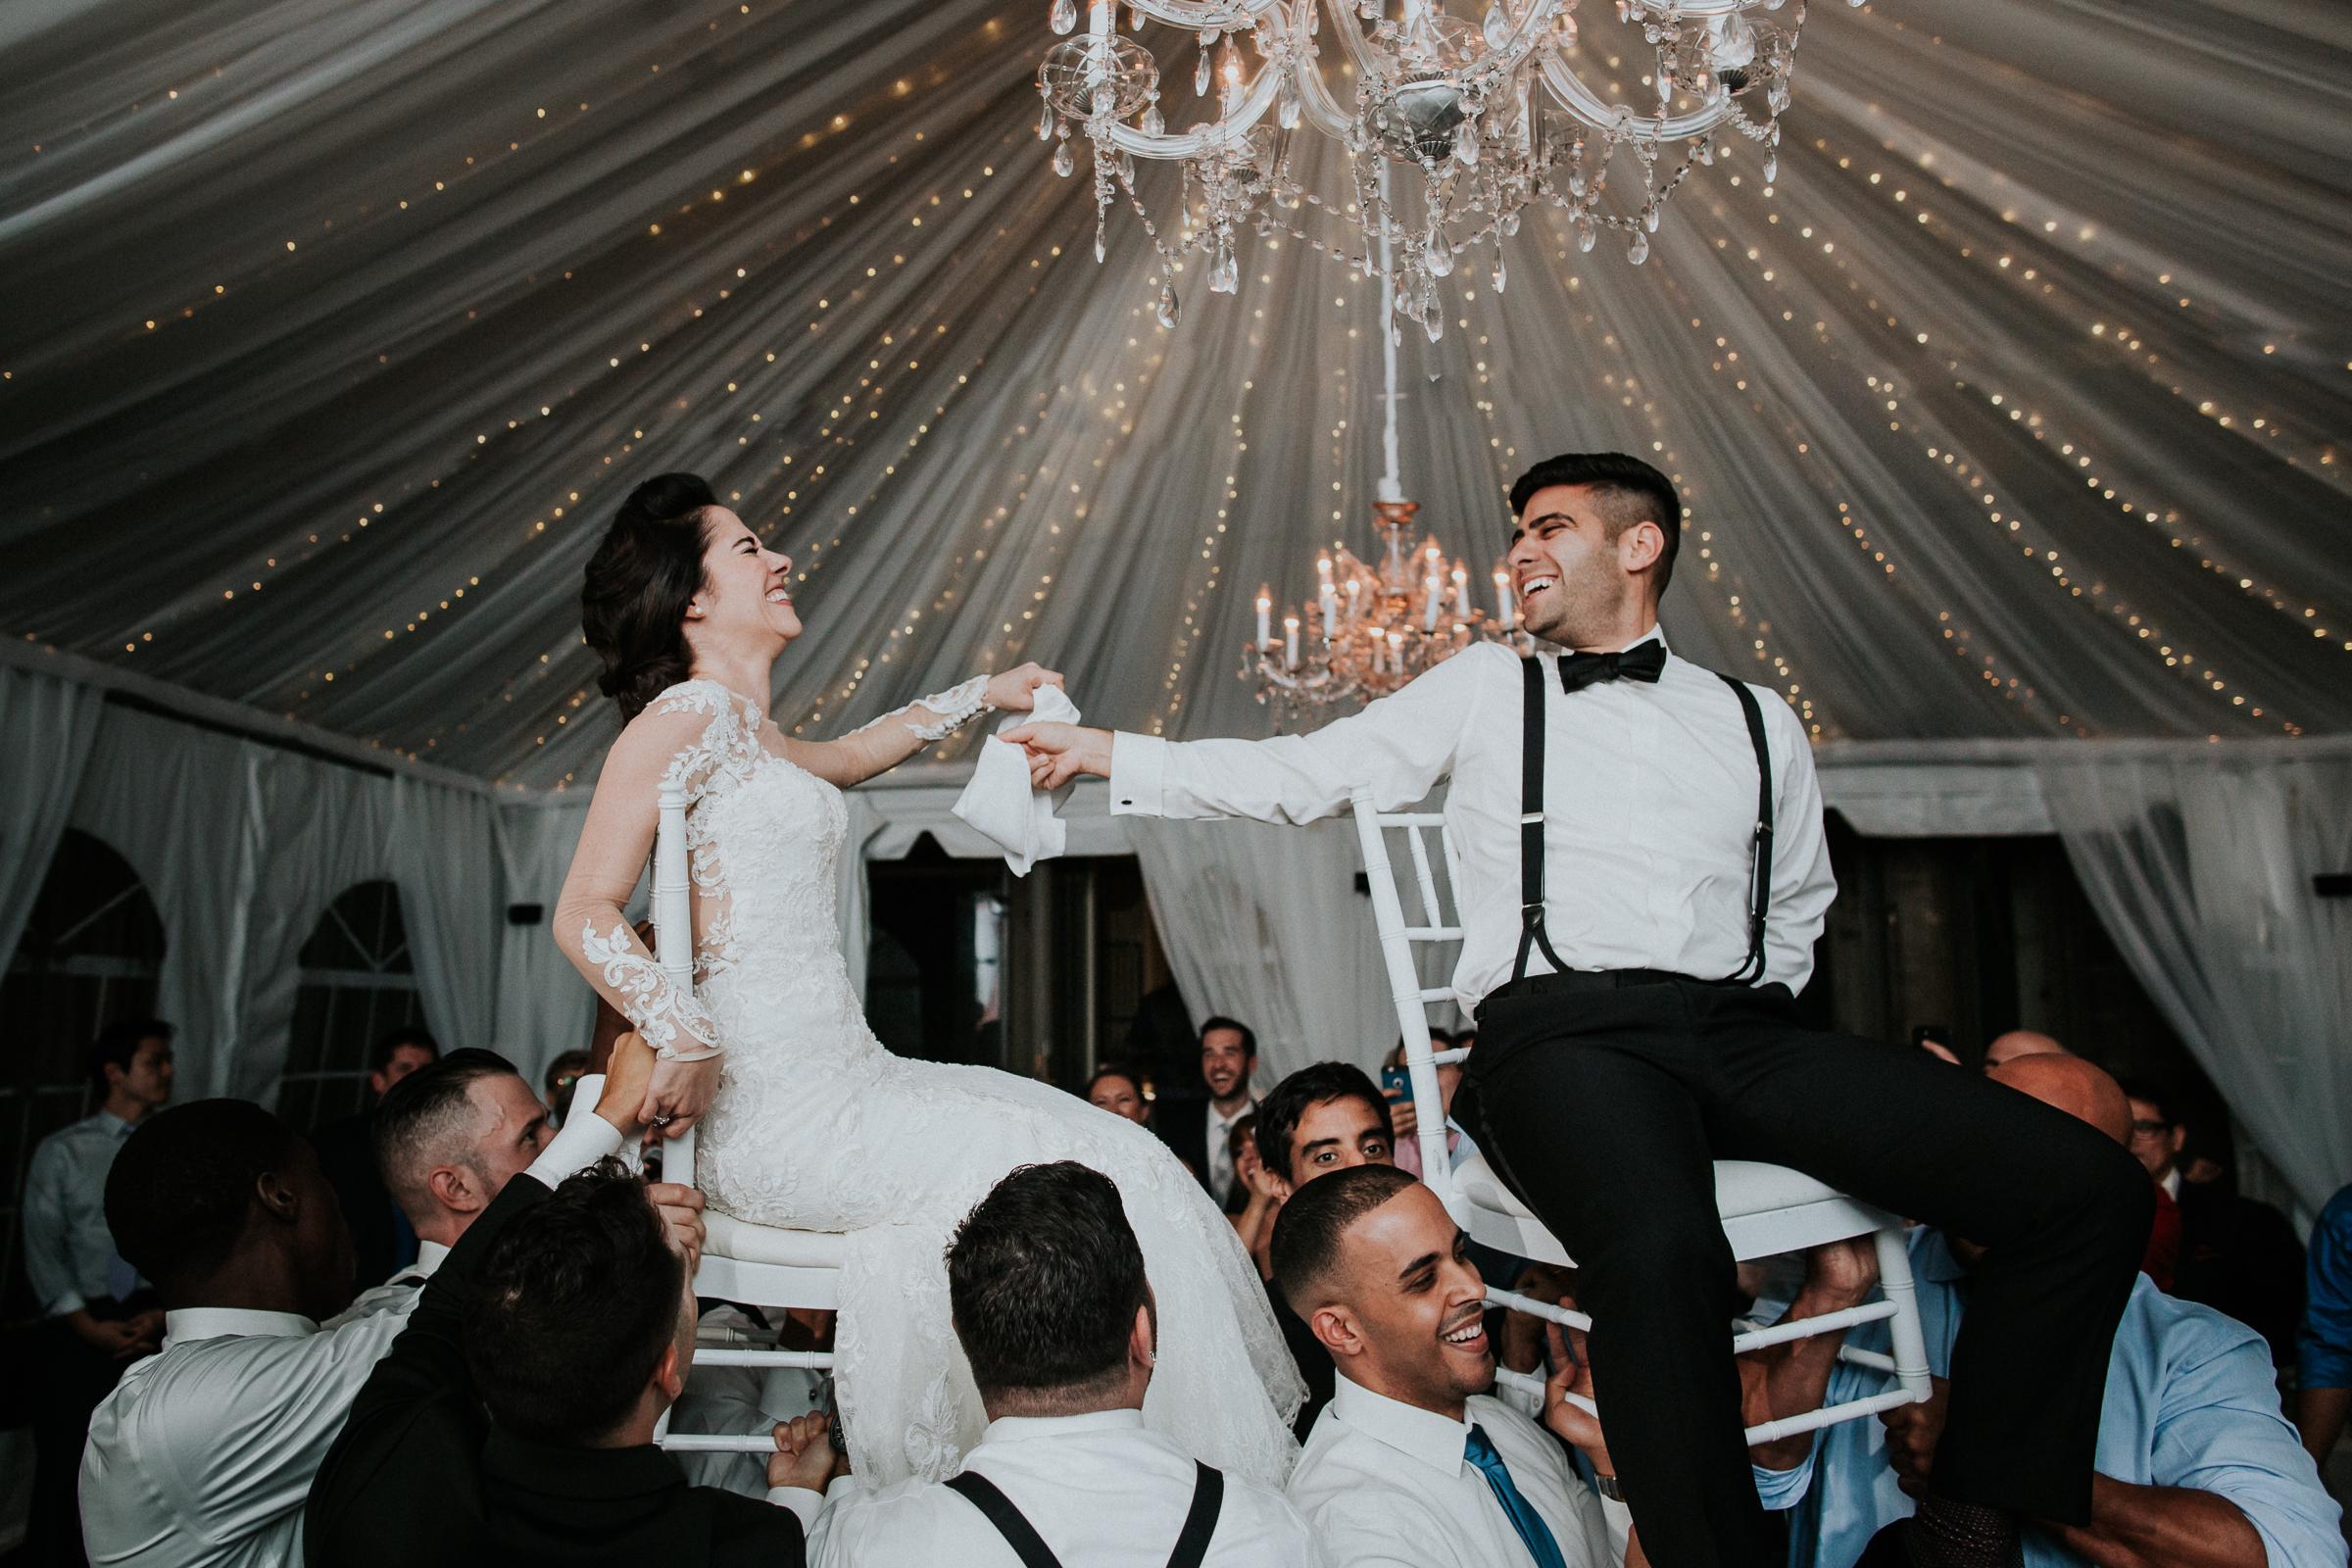 New-York-Documentary-Wedding-Photography-Best-Of-2017-by-Elvira-Kalviste-Photography-105.jpg